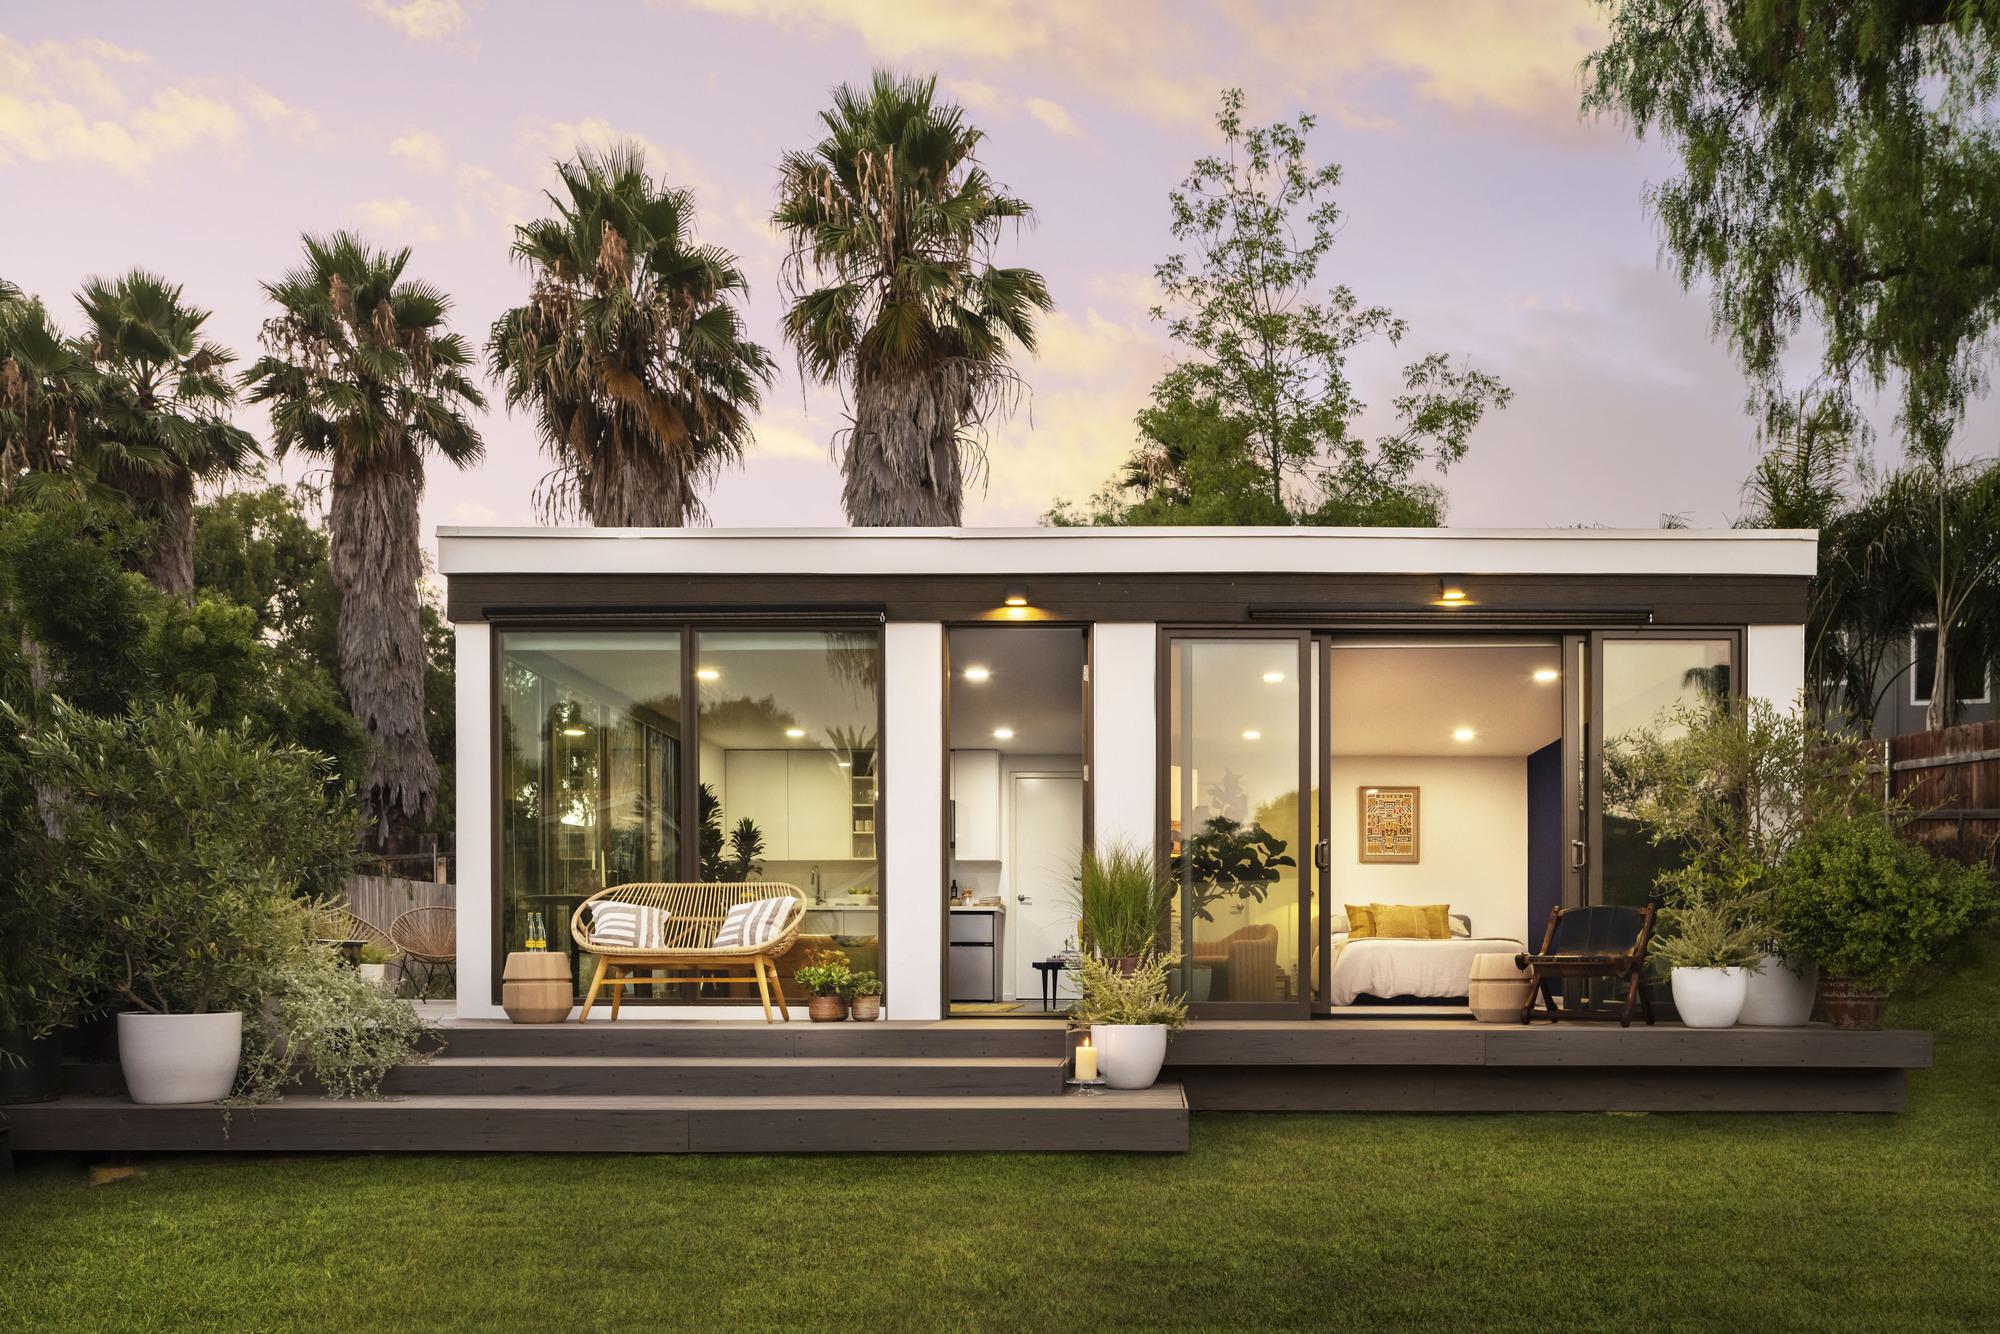 Mighty Buildings Creates New 3D Printed ADU in San Diego